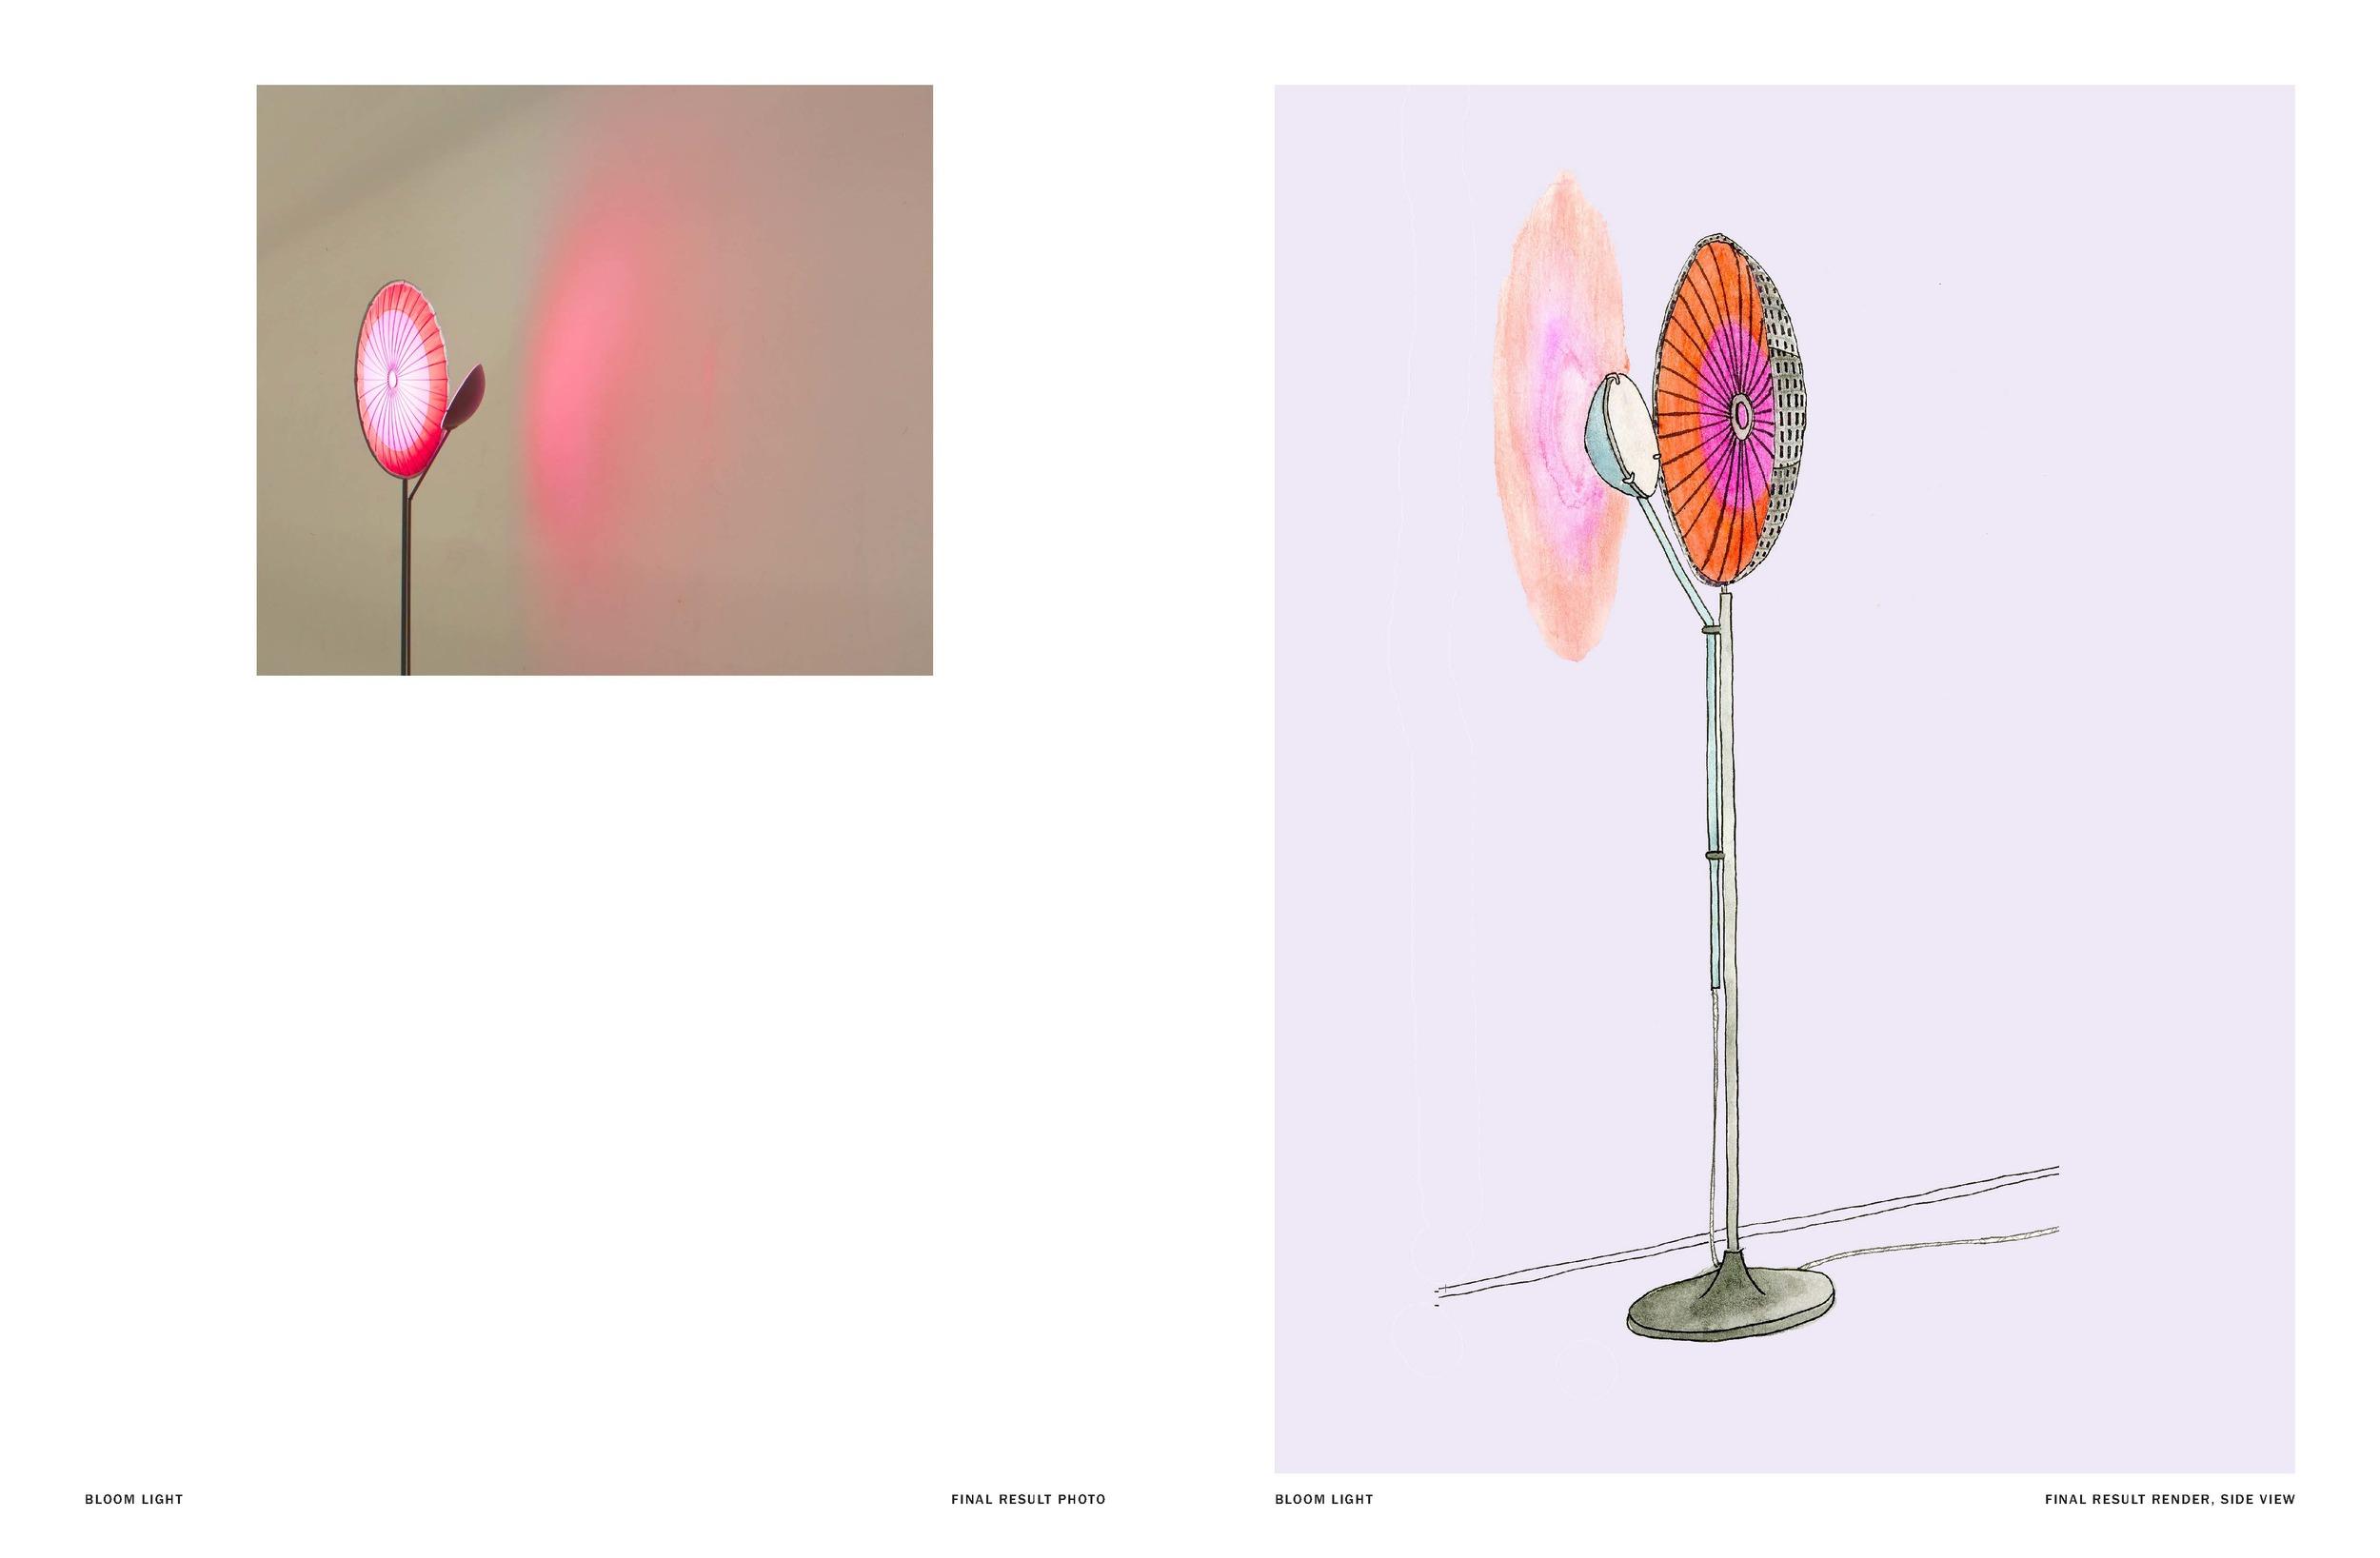 Bloom, light